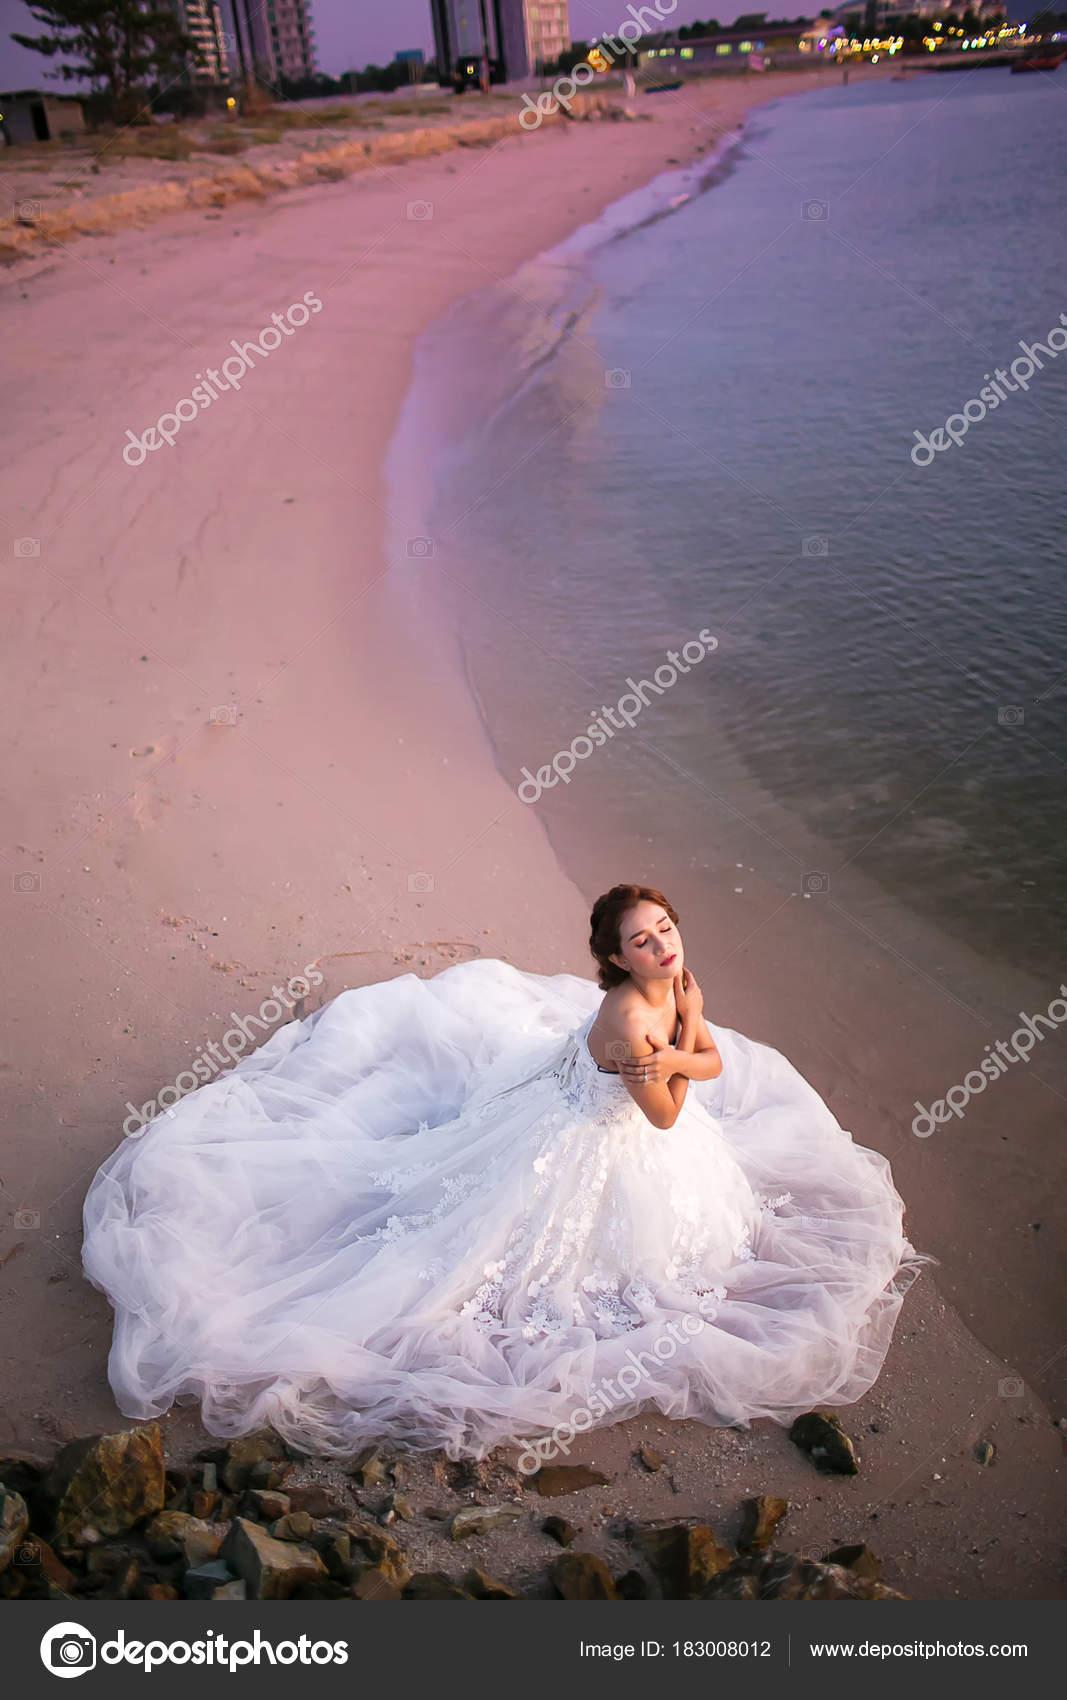 Novia Joven Atractivo Usar Vestido Novia Velo Blanco Estar Sola ...